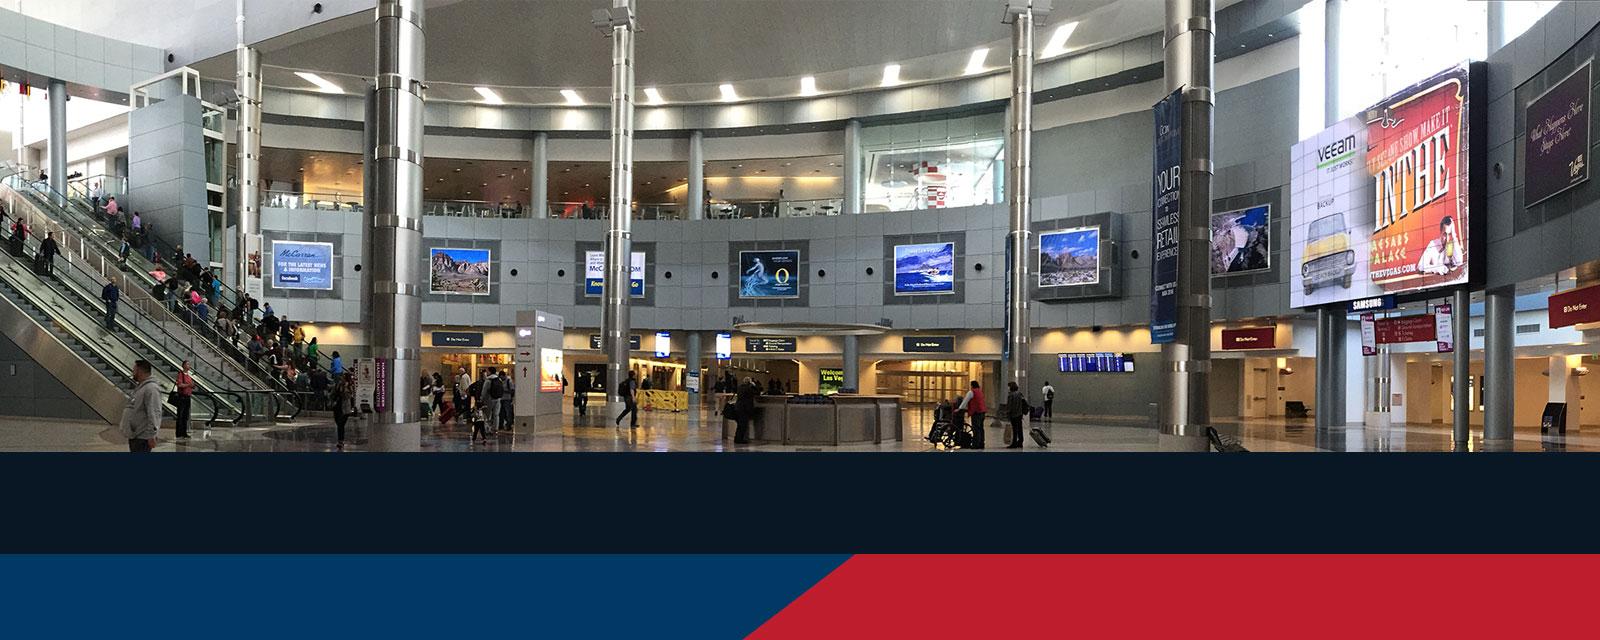 'McCarran International Airport' from the web at 'https://www.mccarran.com/FSWeb/assets/LAS/images/images_jssor/jssor_LAS_home_trams_2.jpg'